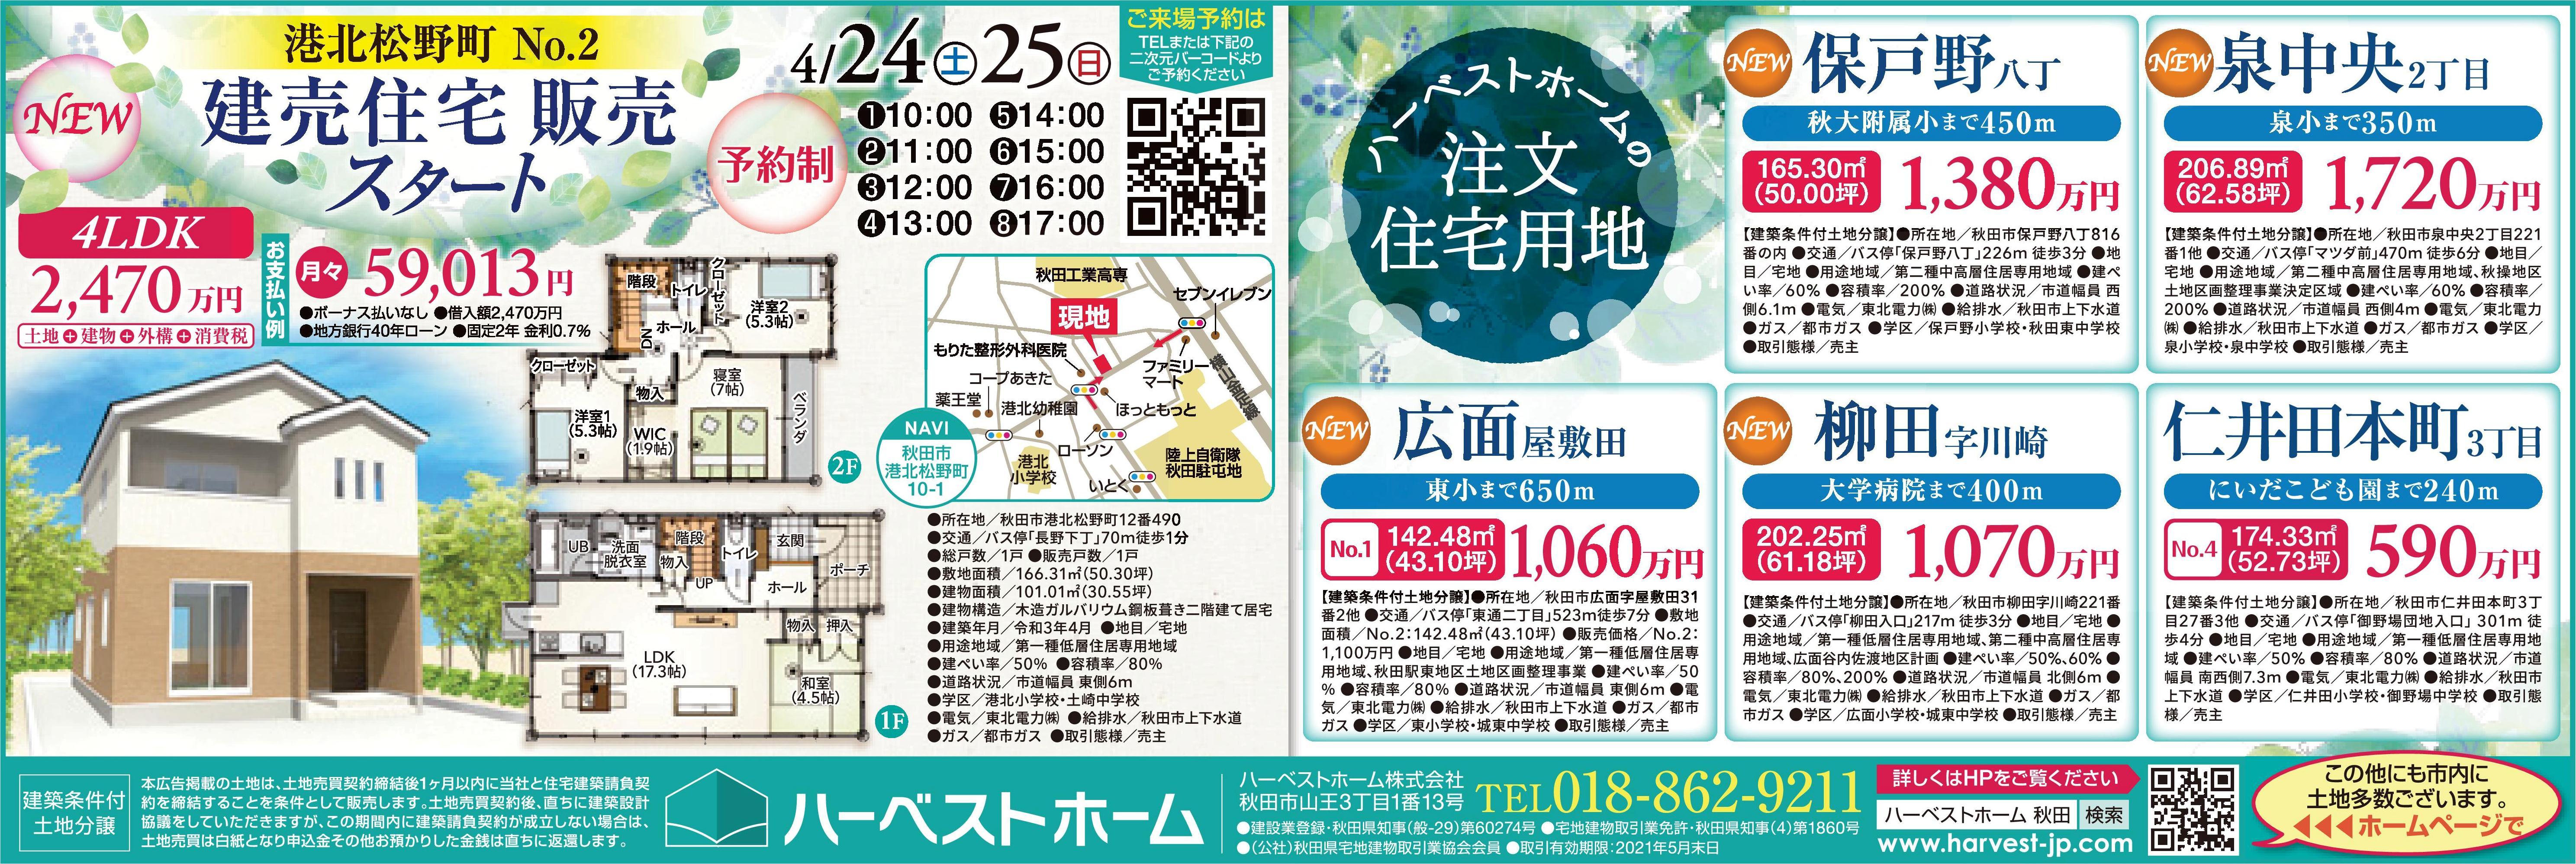 『建売住宅 / 港北松野町』…販売スタート 「土地相談会」も同時開催